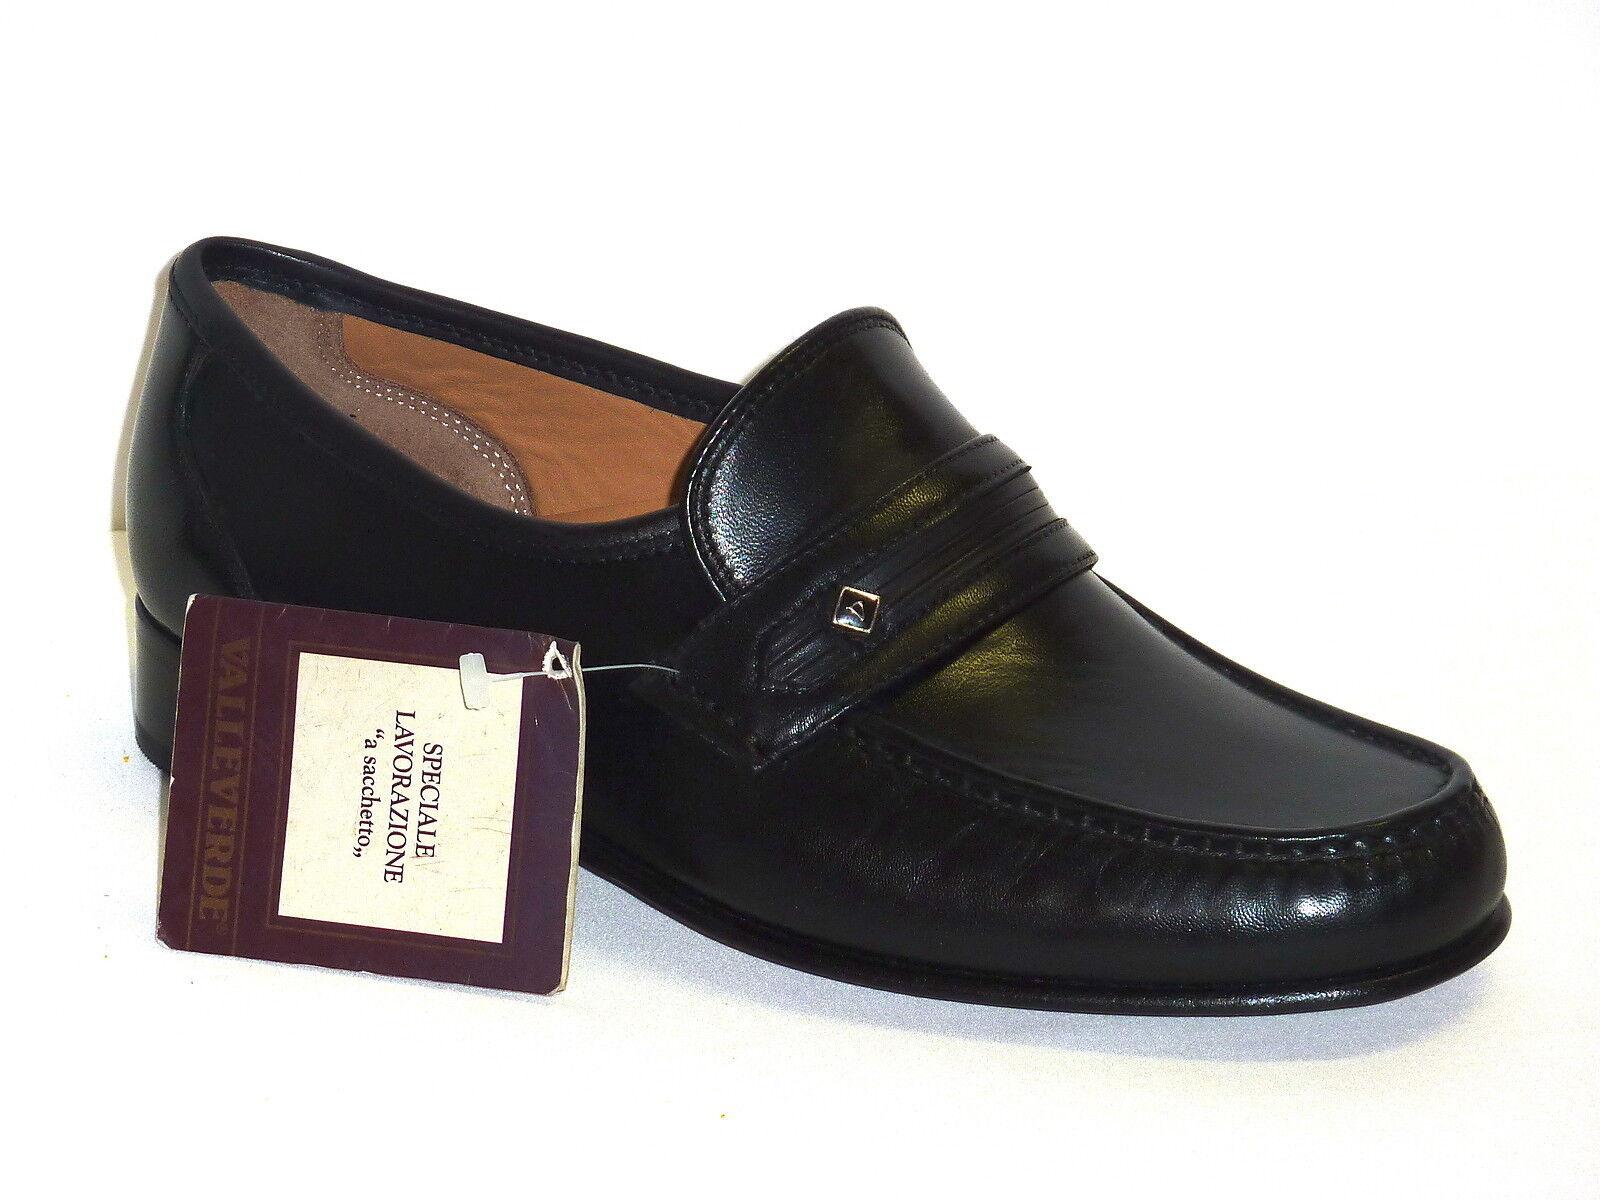 4929 VALLEgreen shoes MOCASSINI CLASSICHE men PELLE black MODA COMODA n. 44